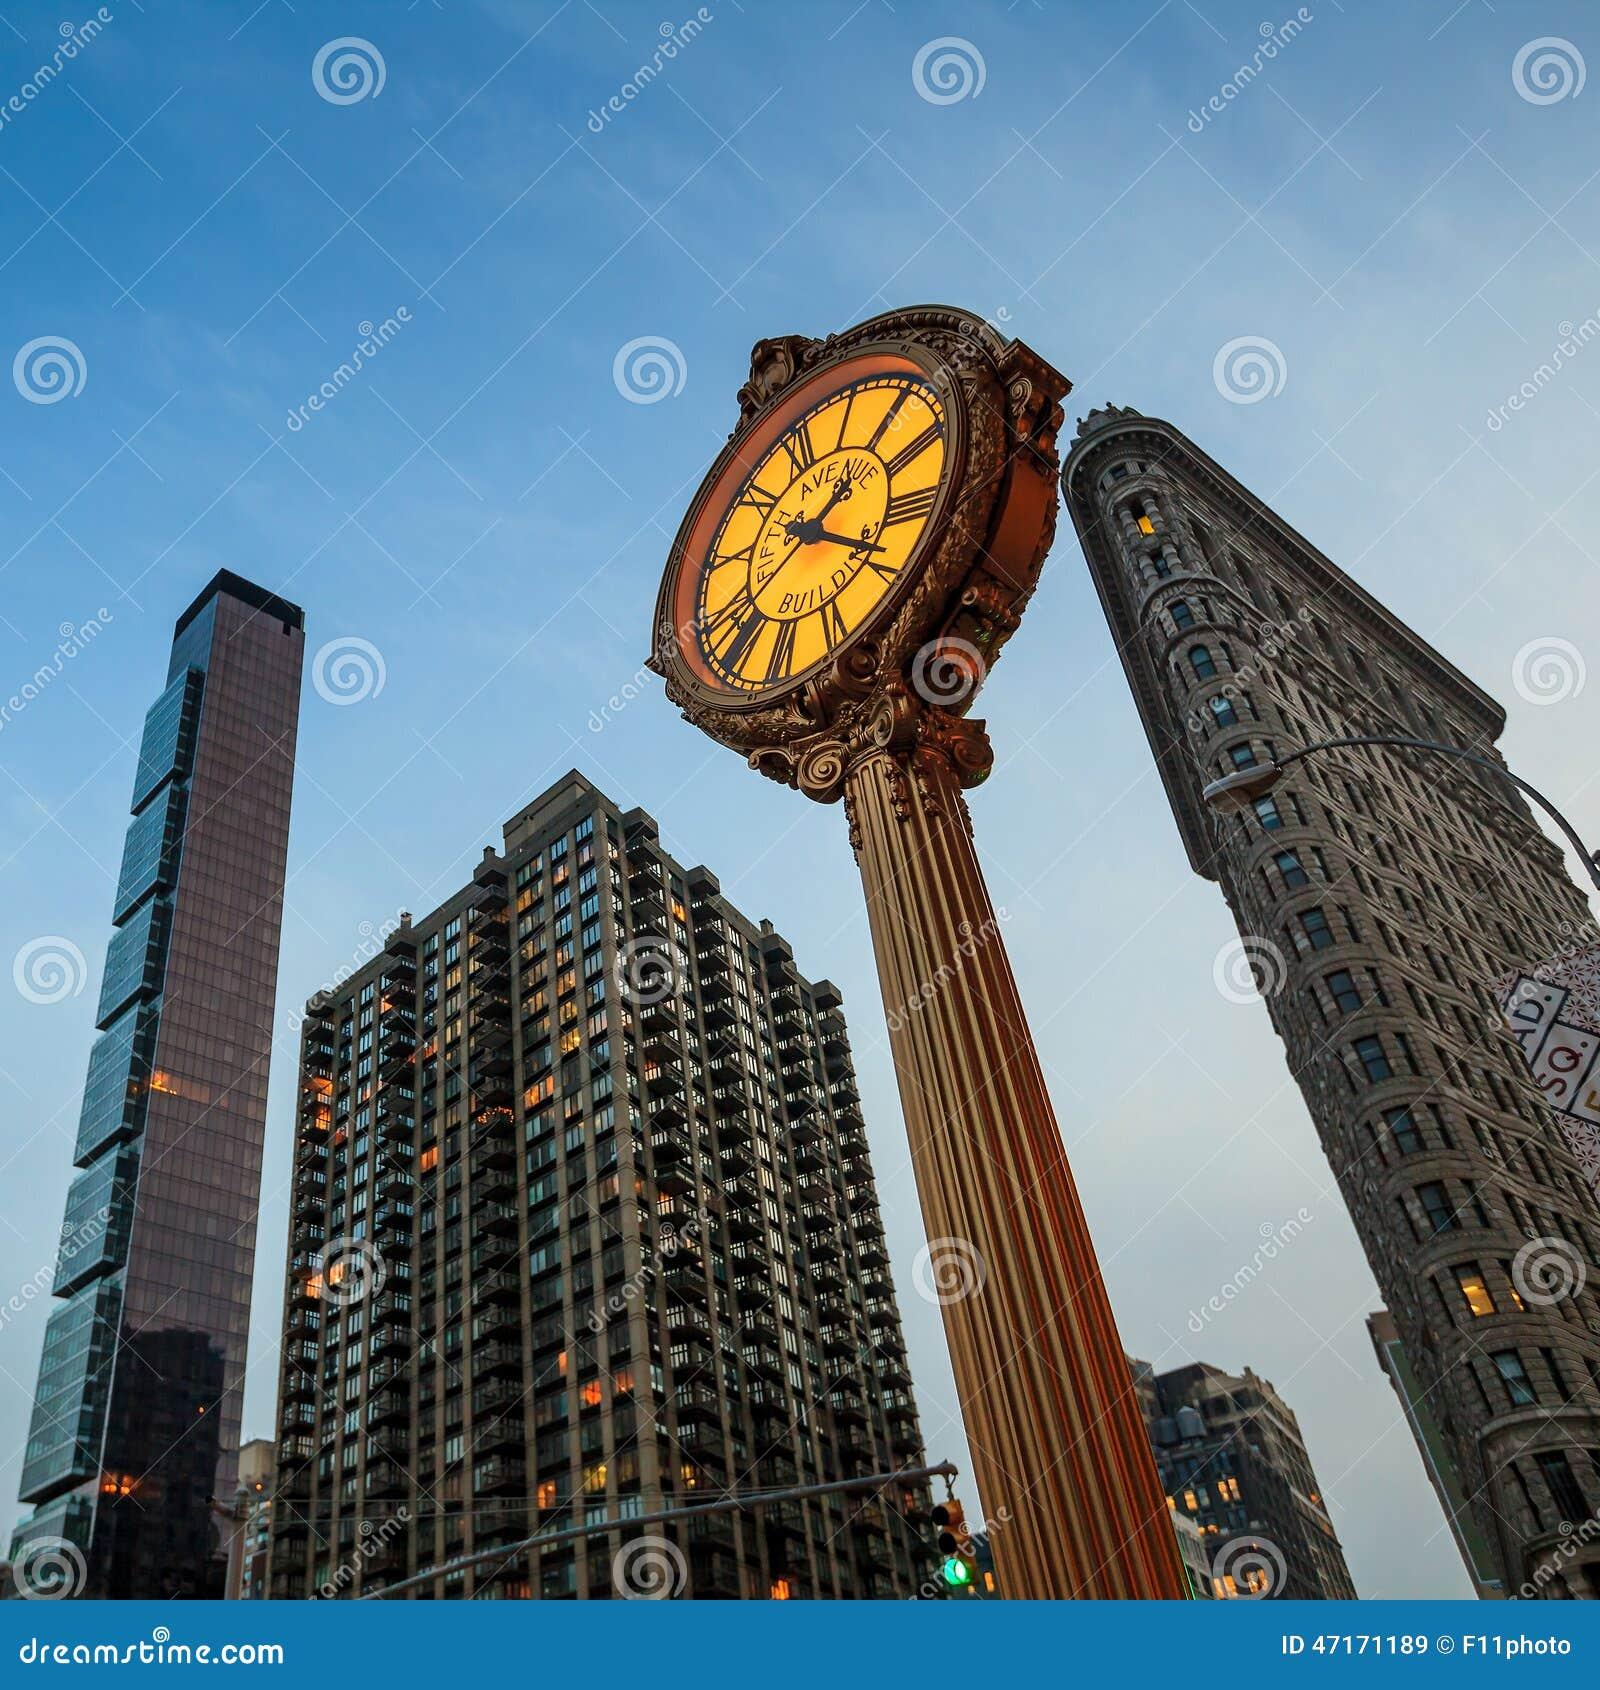 10 Manhattan Ave New York Ny 10025: Landmark Fifth Avenue Cast Iron Sidewalk Clock Stock Image